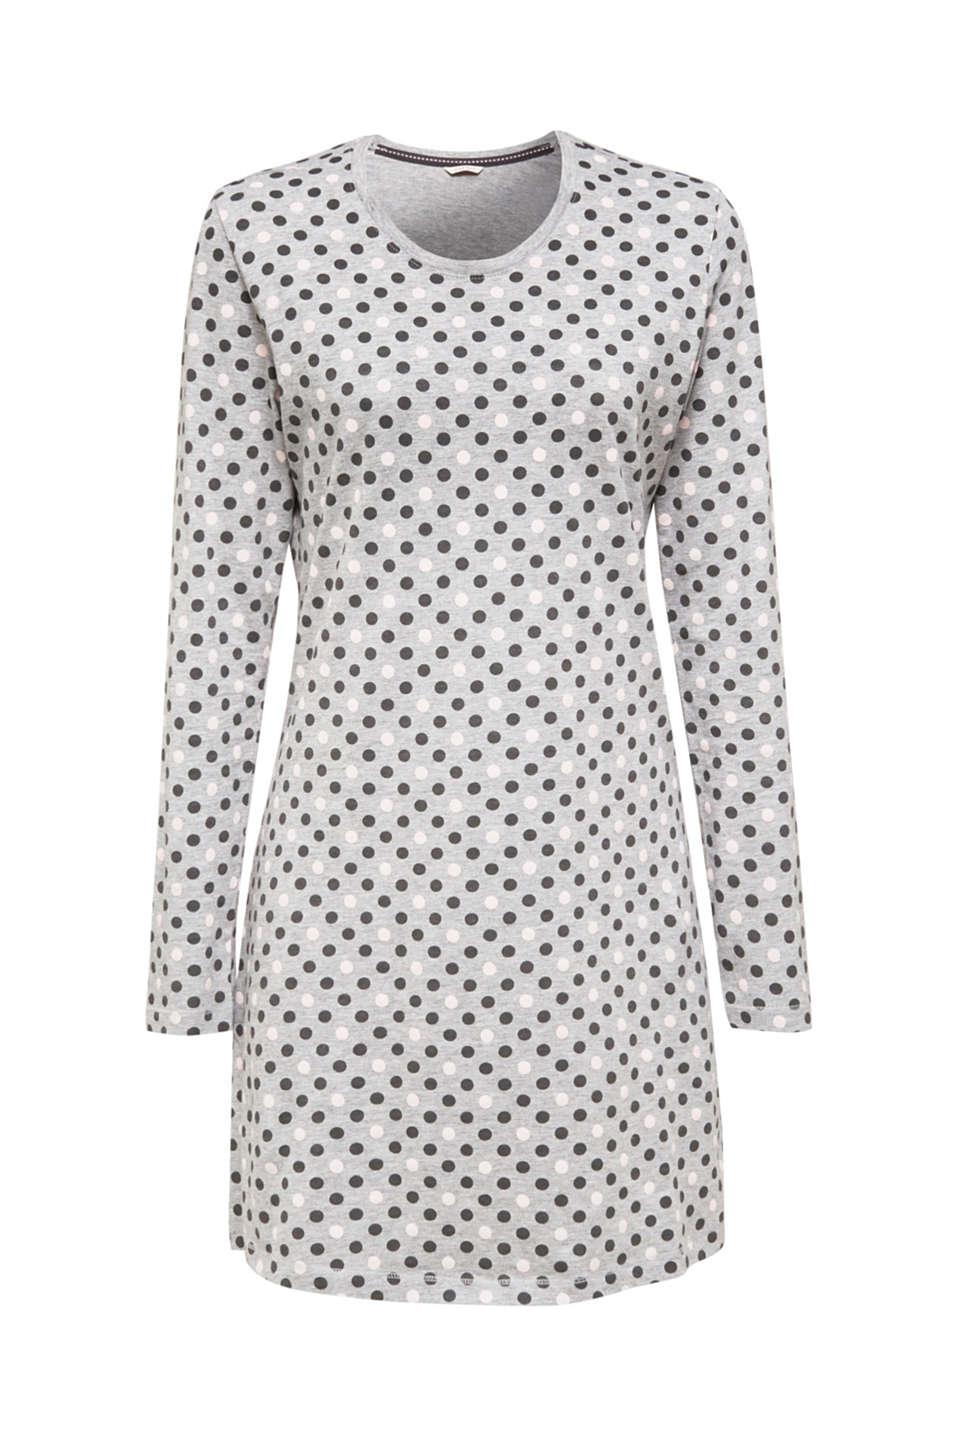 Jersey nightdress with polka dot print, MEDIUM GREY, detail image number 3